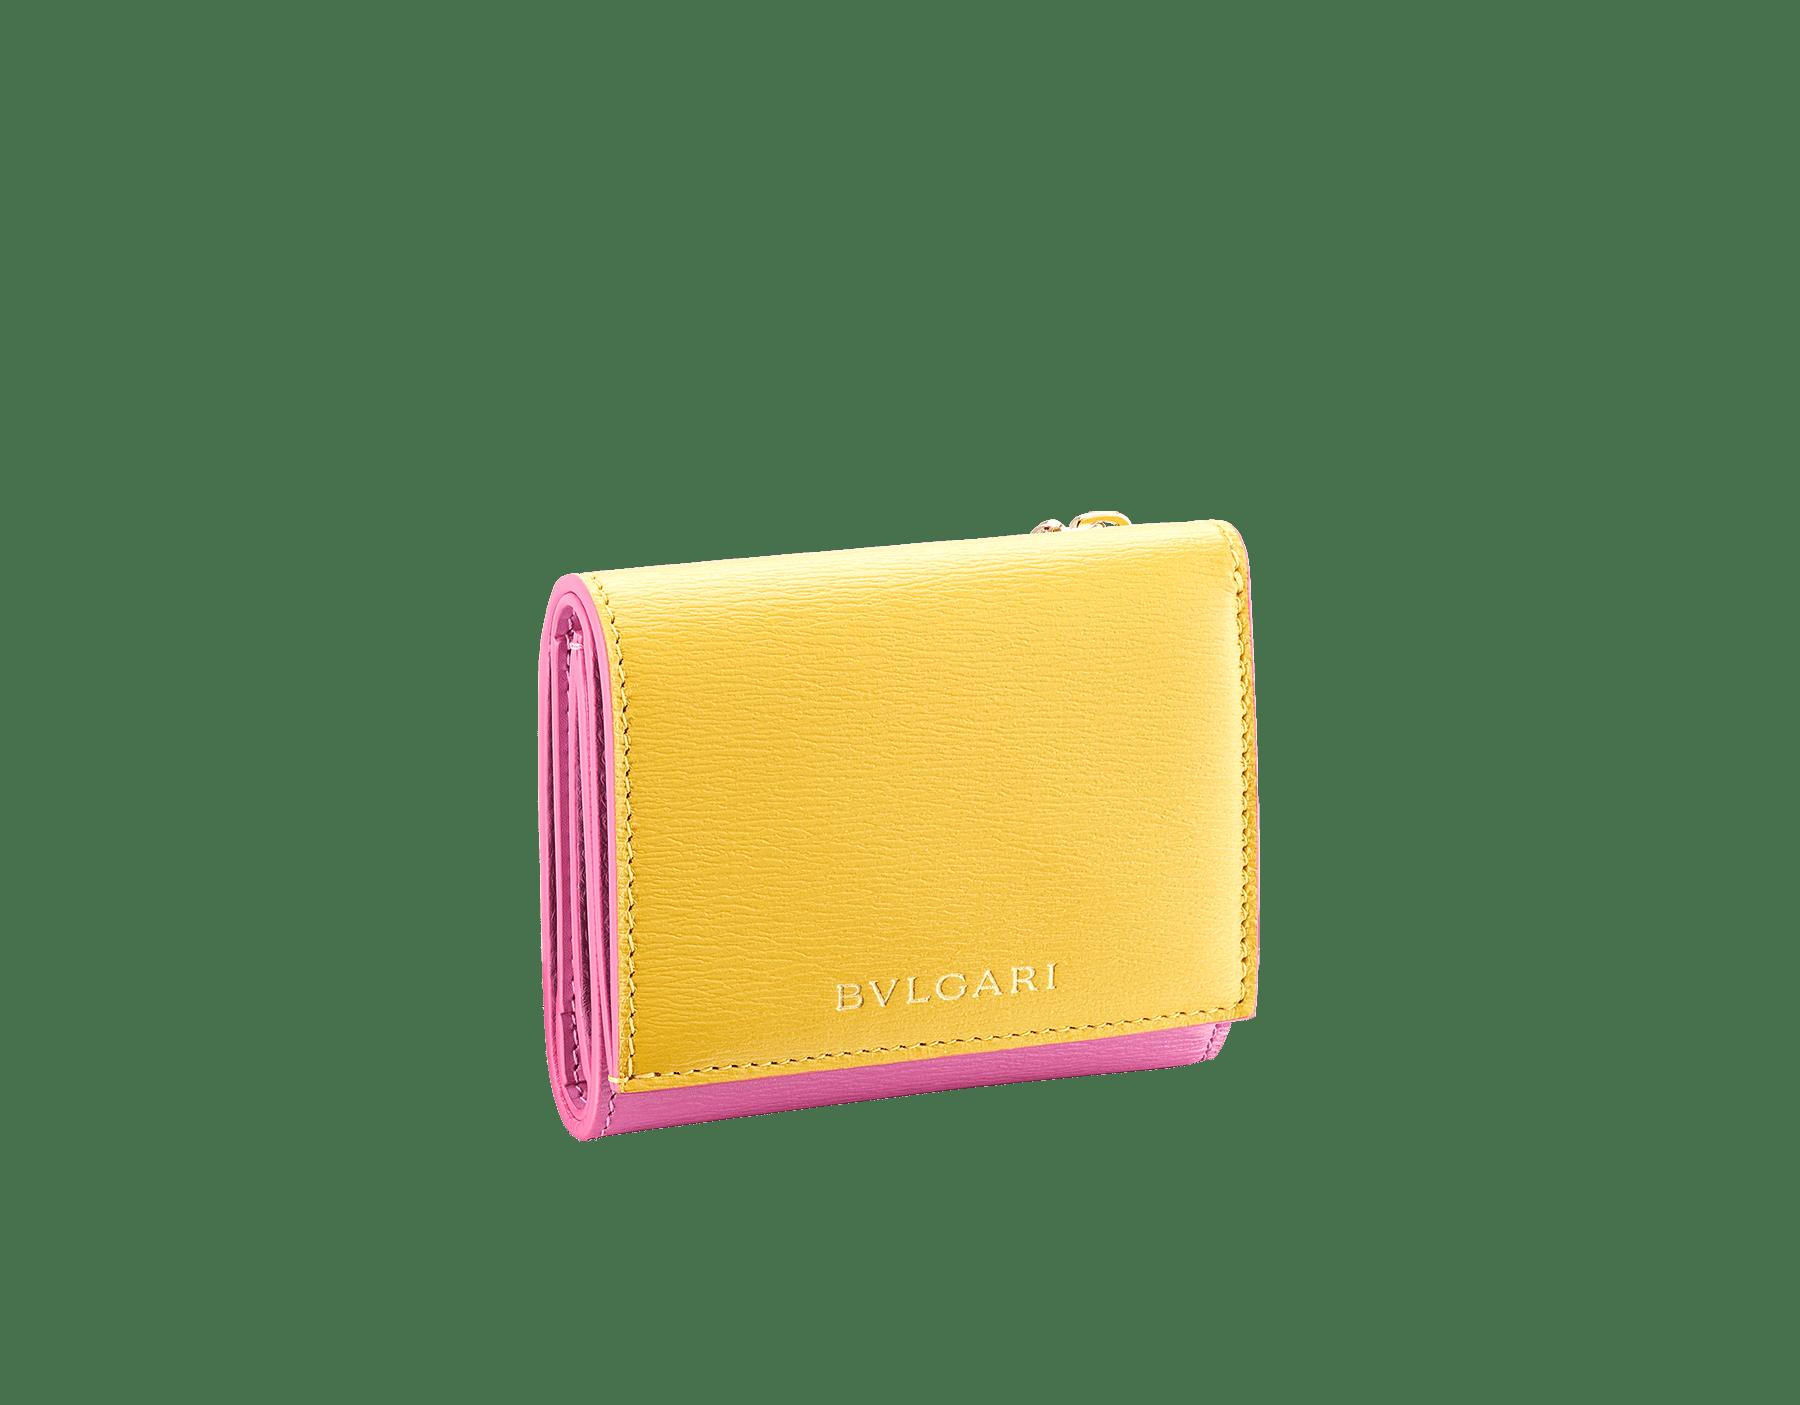 B.zero1 compact wallet in daisy topaz, taffy quartz goatskin and taffy quartz nappa leather. Iconic B.zero1 zipper in light gold plated brass and two press stud closures. BZA-SLIMCOMPACT image 1